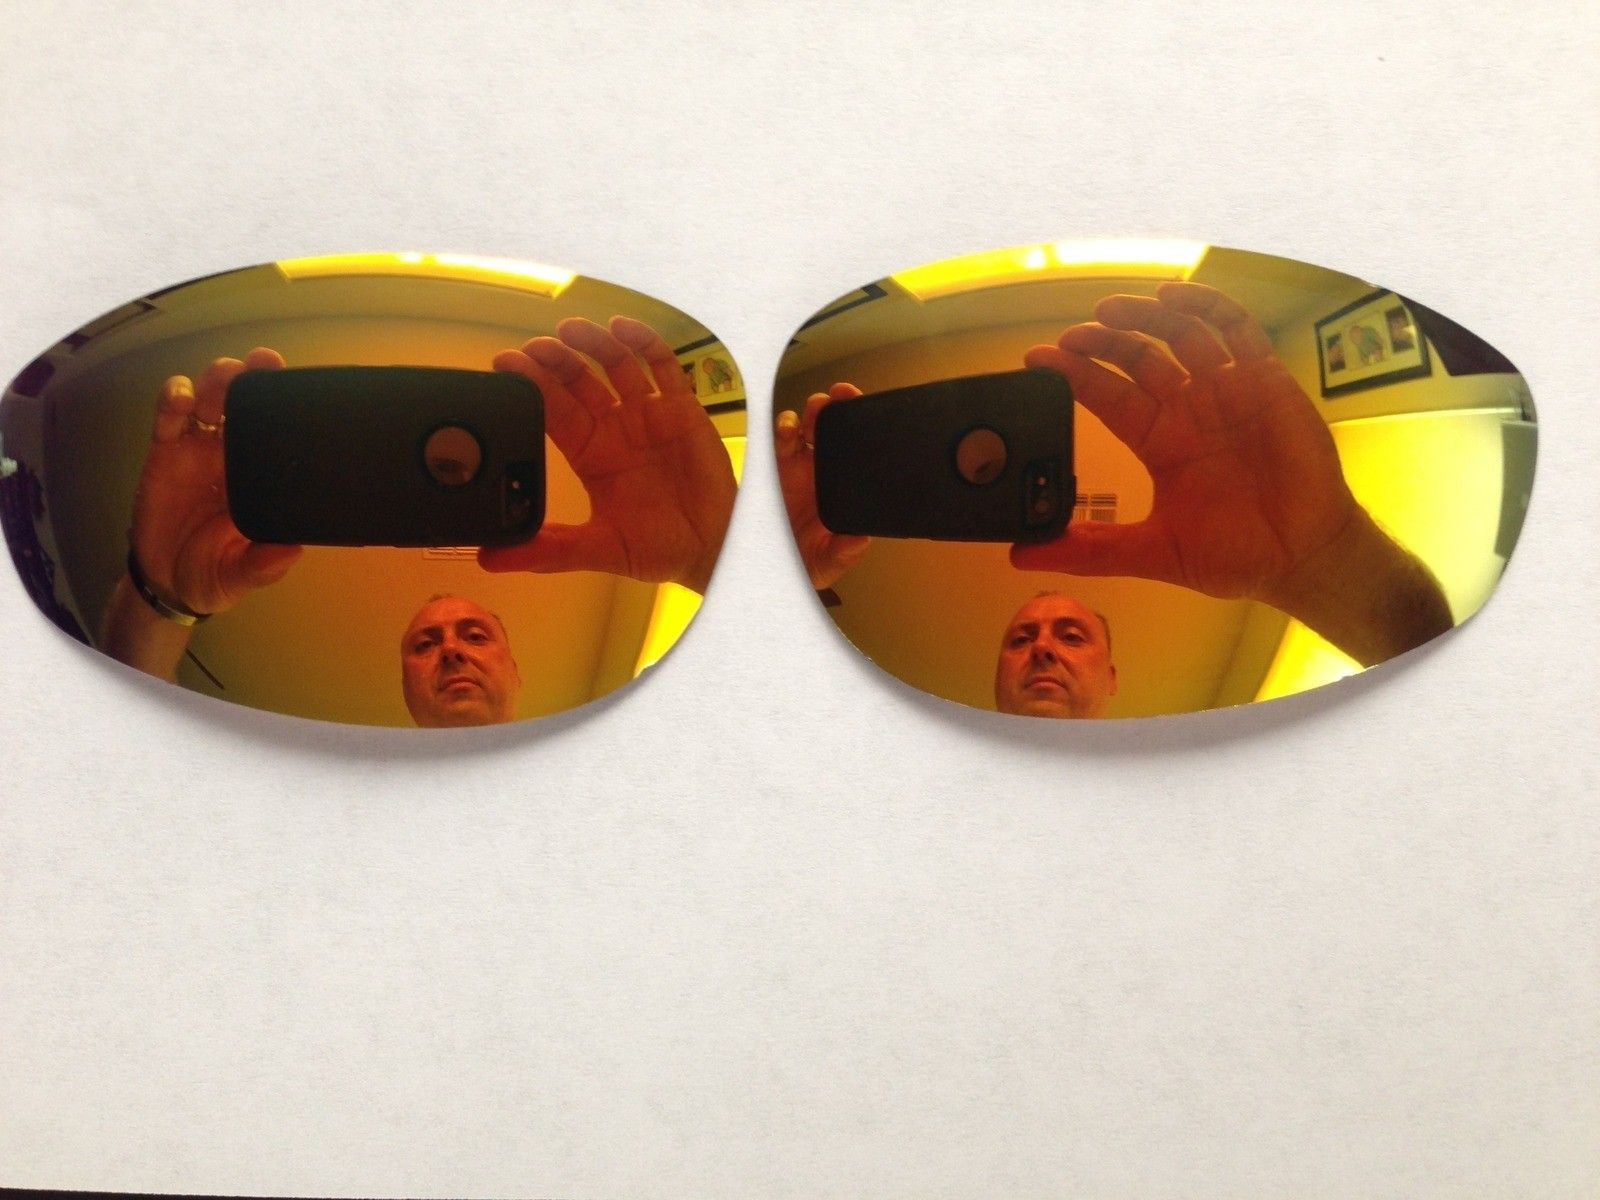 Fire Polarized Original Straight Jacket Lenses - cH6Yyb.jpg